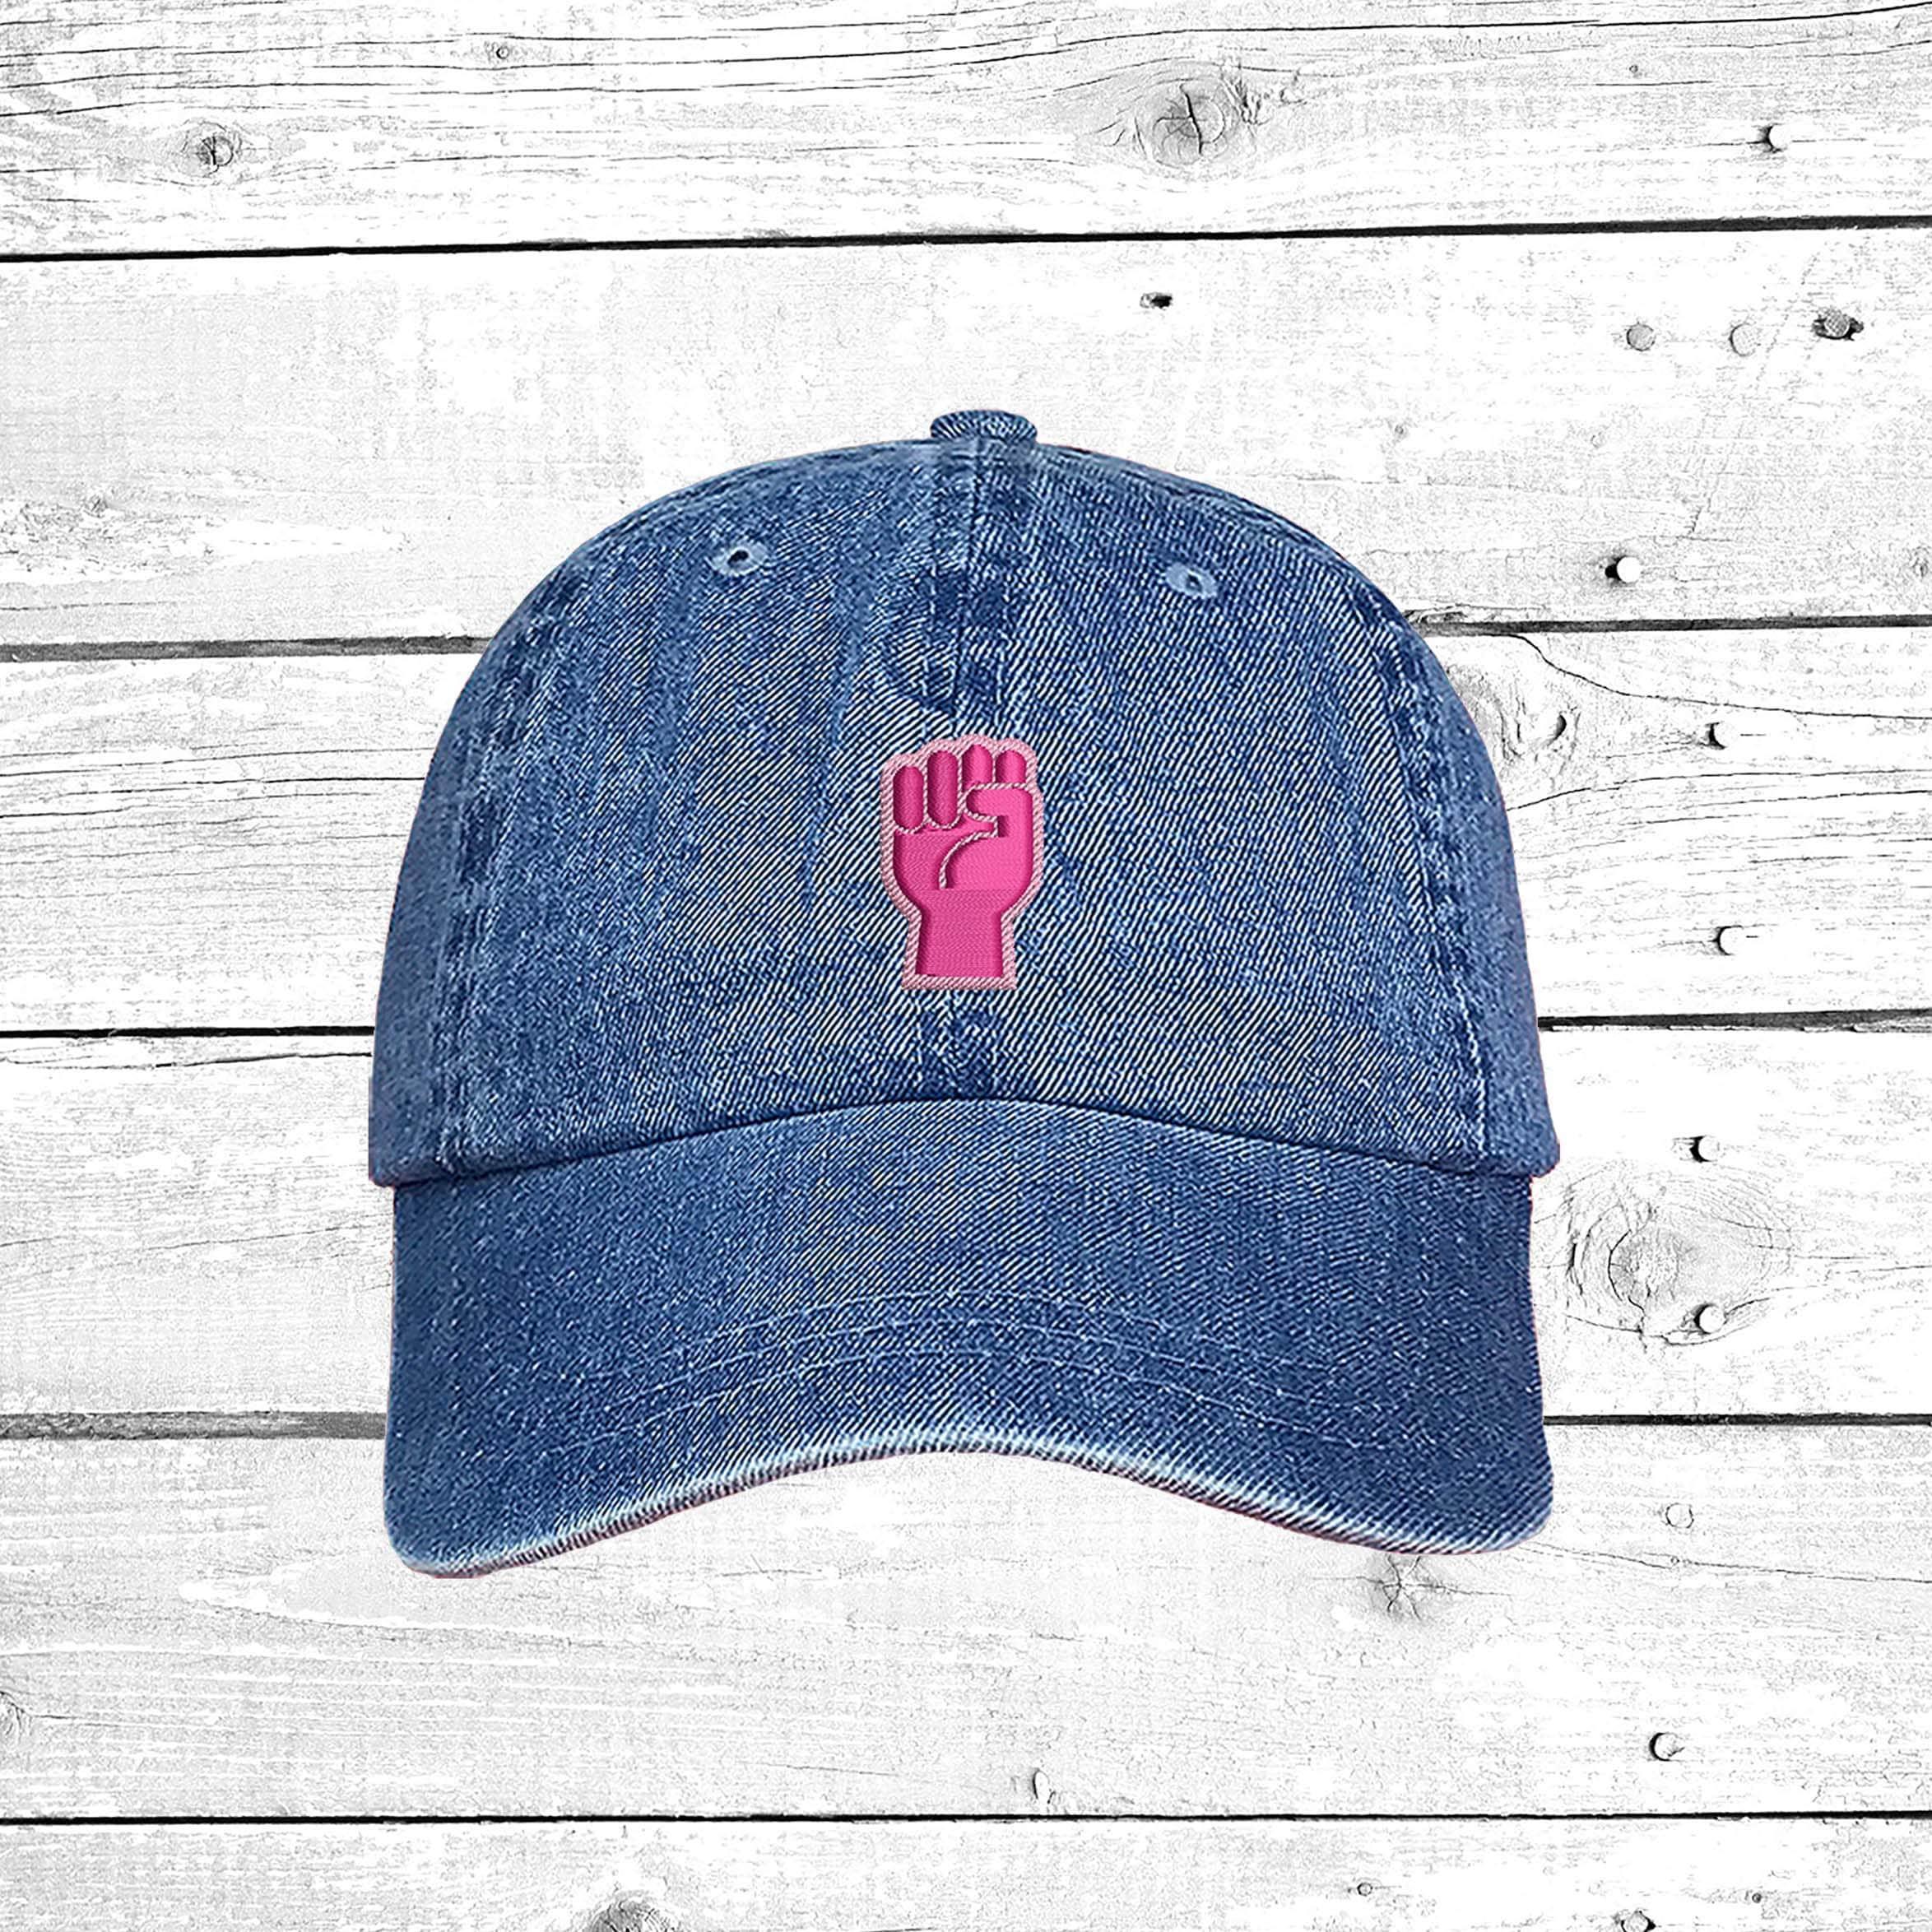 02974a9c05e9c ... Feminist Baseball Cap Girl Boss Hat for Womens March Unisex Dad Hats  Girl Power Gift for hat lover. gallery photo ...